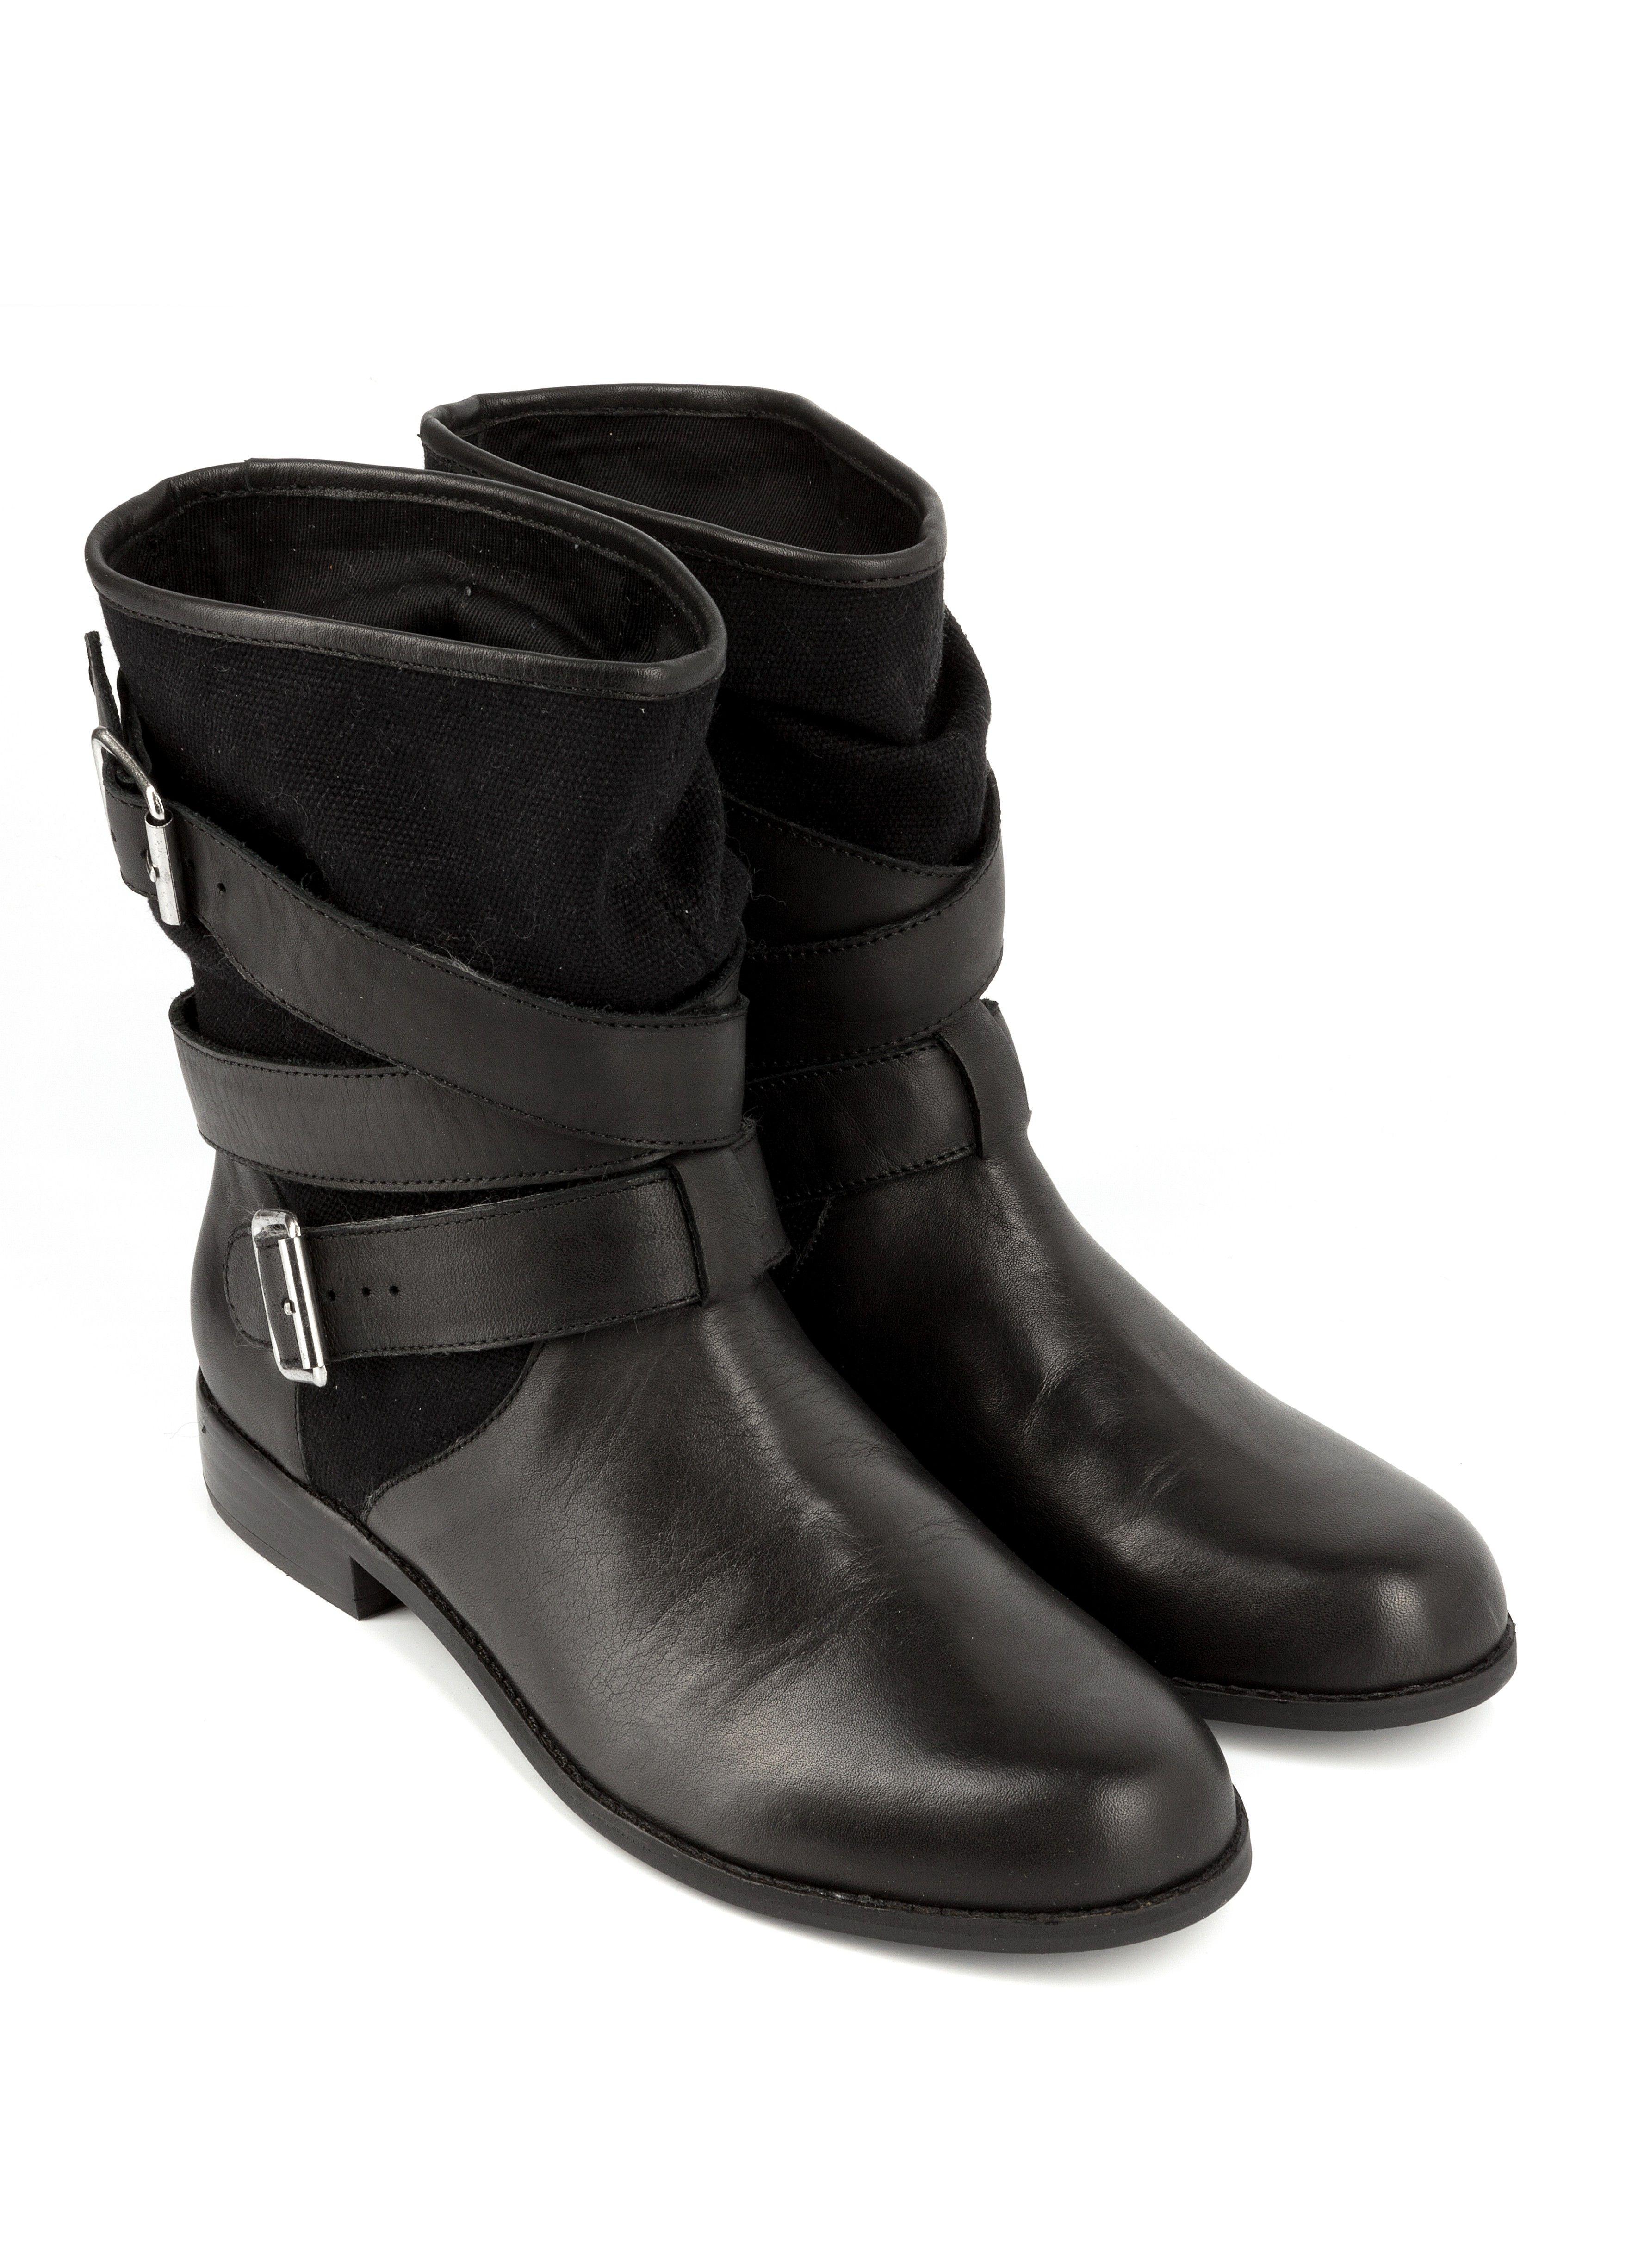 ded0a4c4a237e Boots à sangles NATALYA Noir - Bottines plates - CHAUSSURES FEMME - FEMME